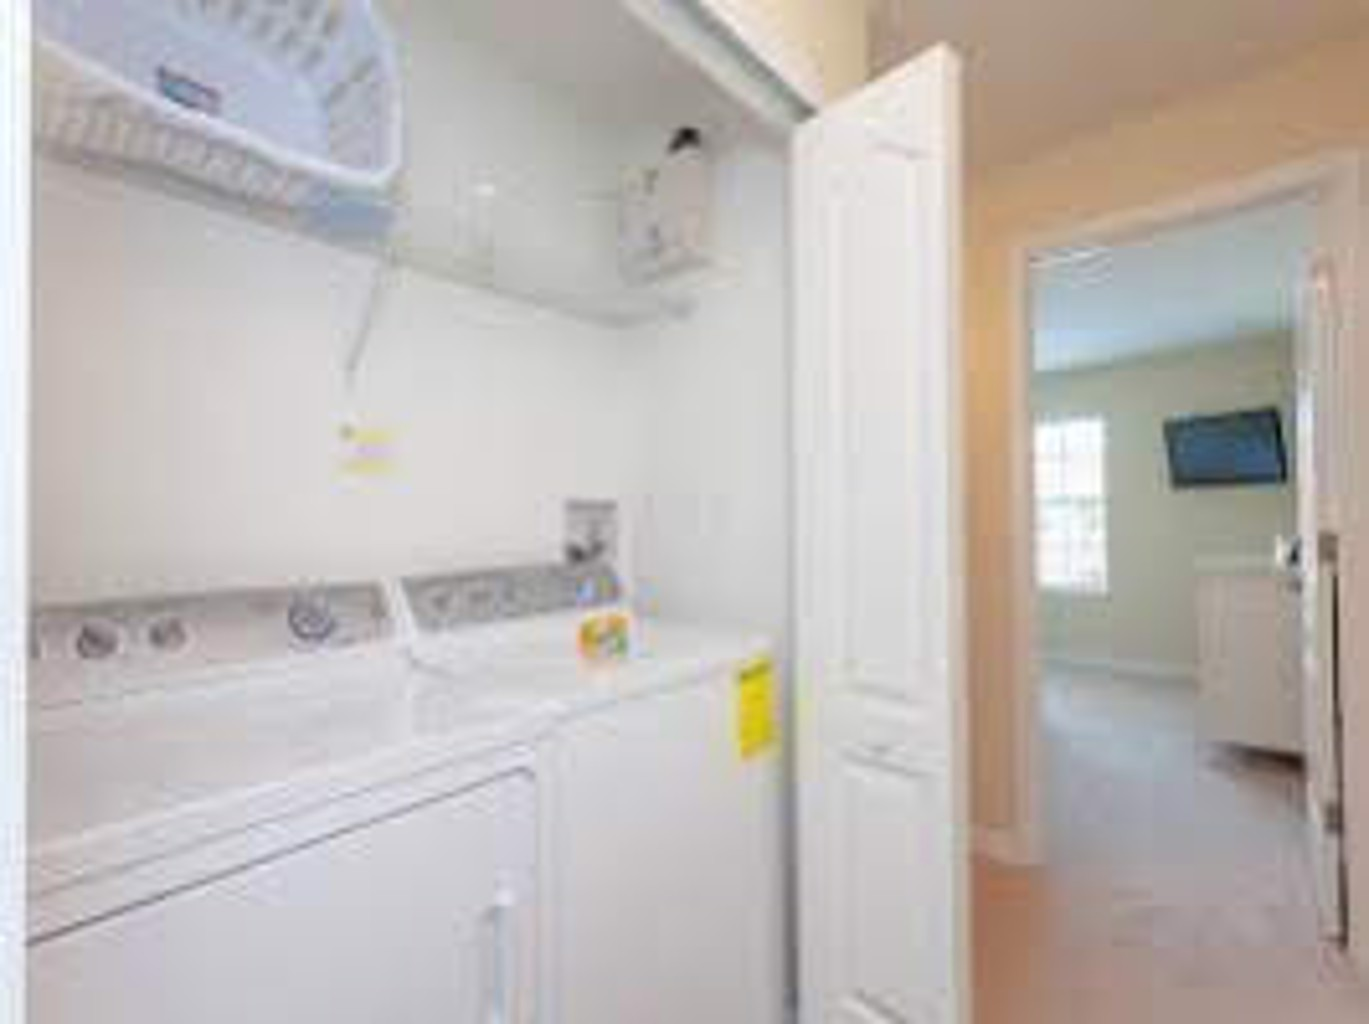 Charming 4 bedroom 3 bath home